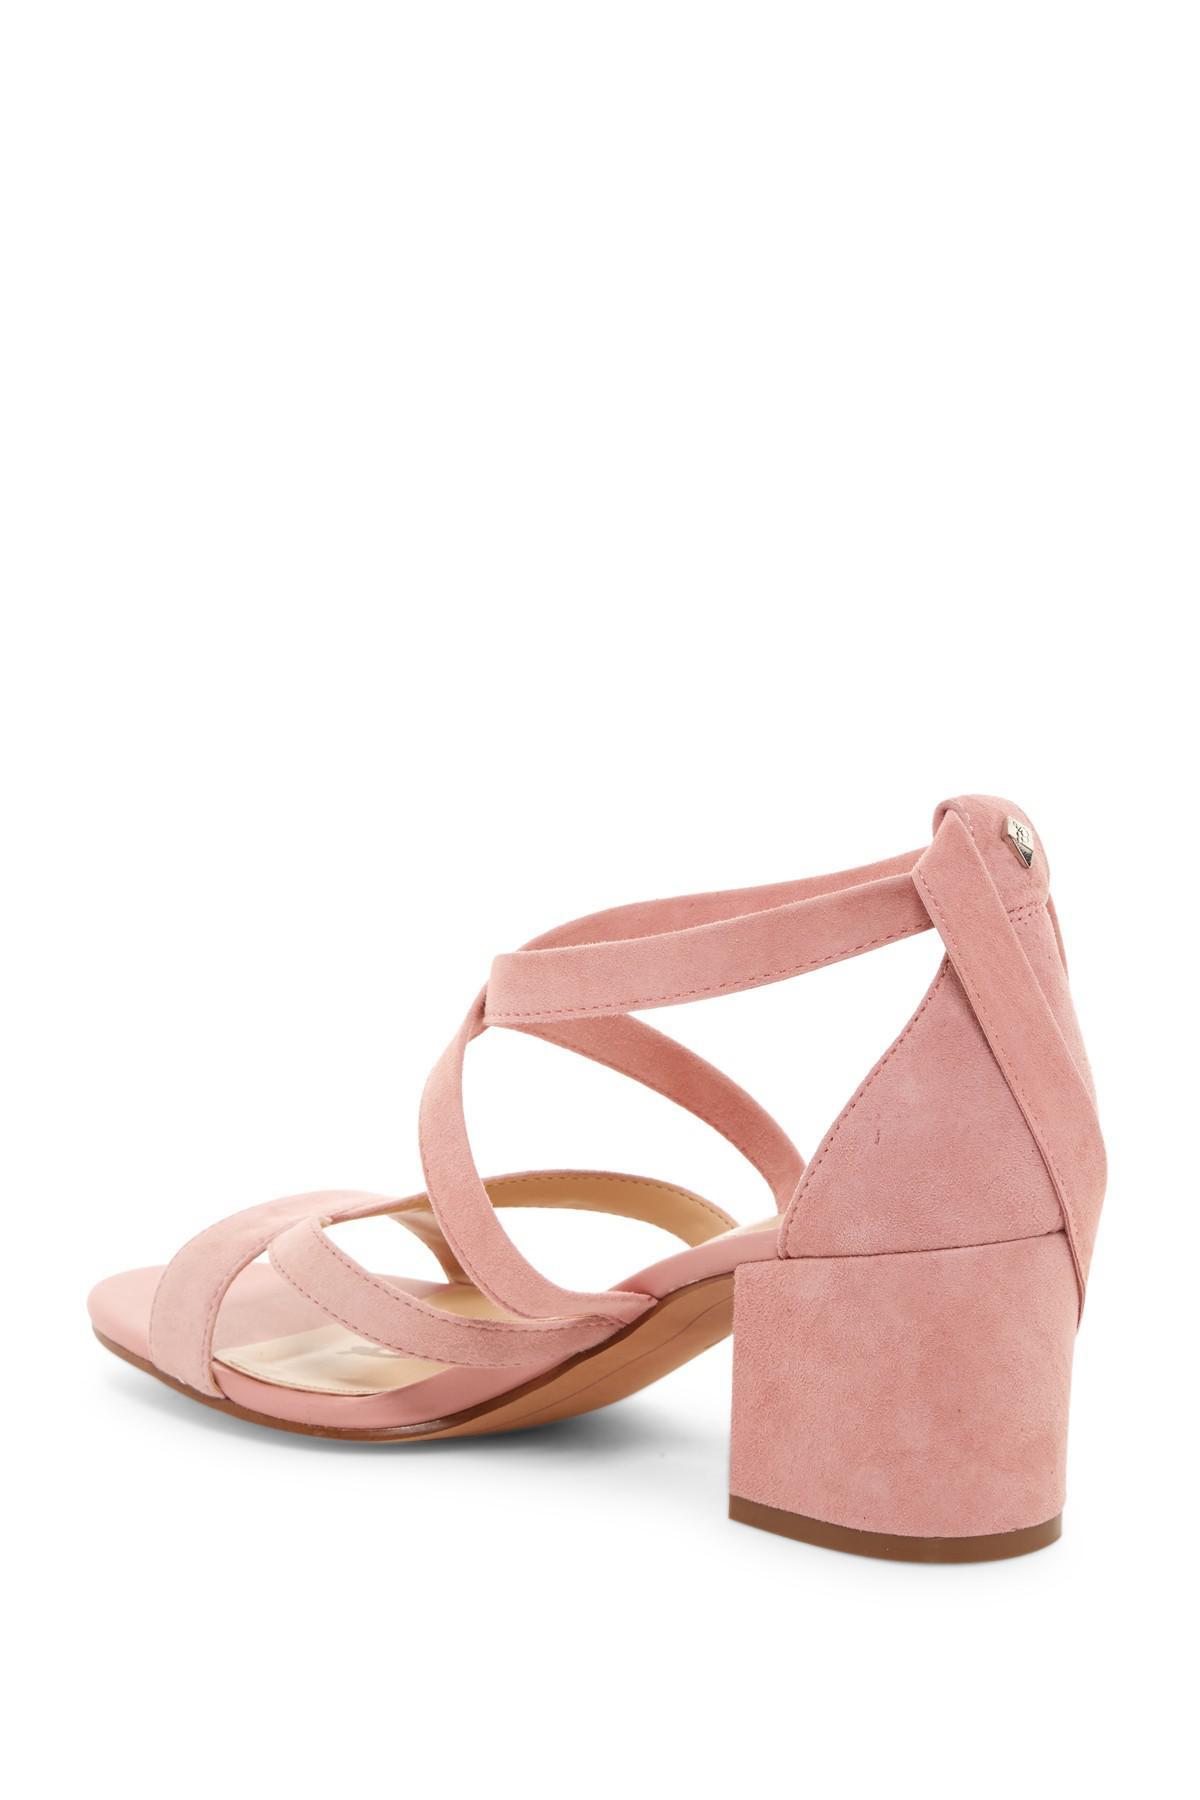 39f520933083 Lyst - Sam Edelman Sheri Wrap-ankle Block Heel Sandal in Pink